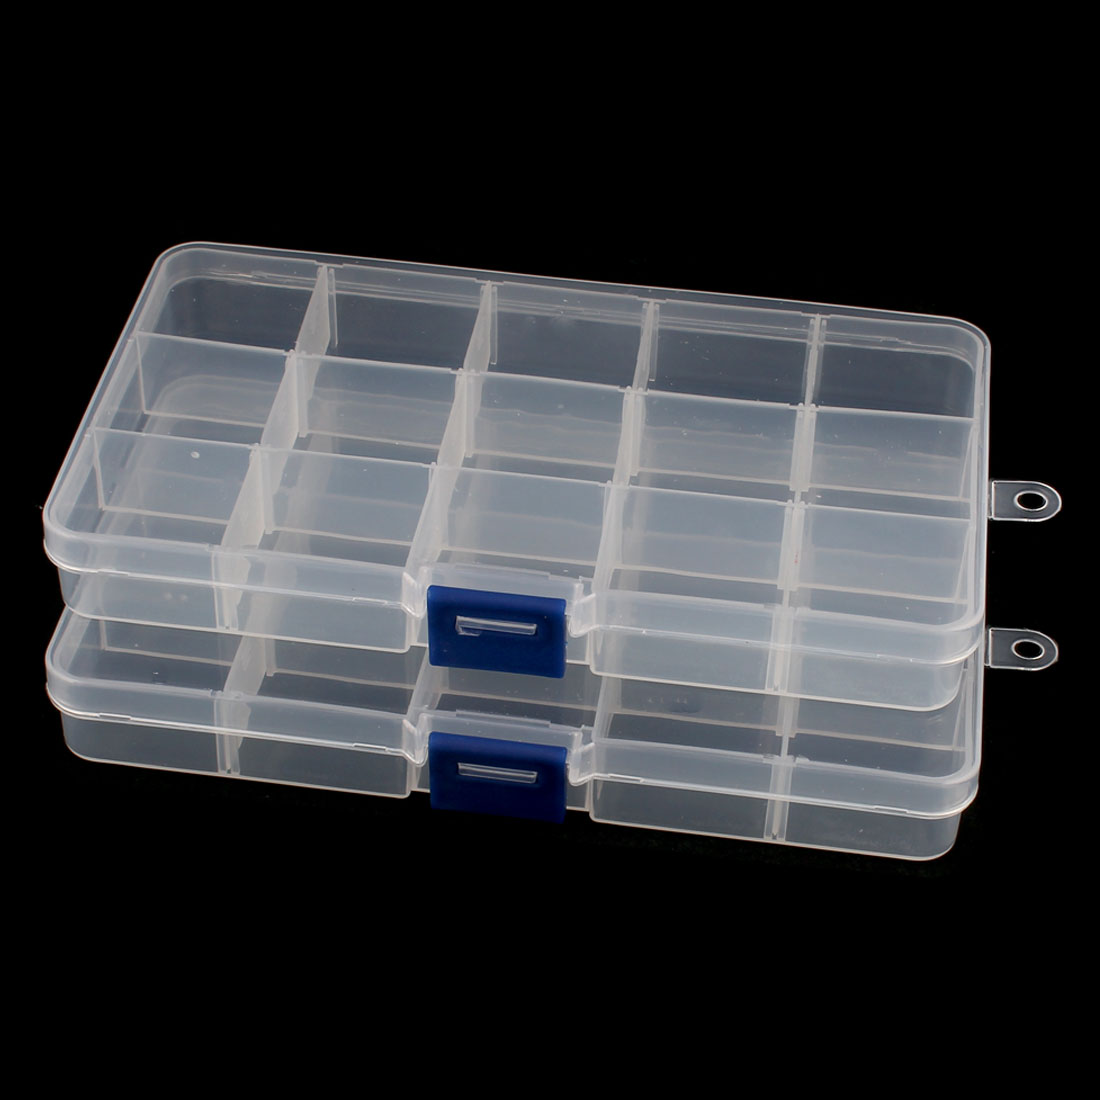 2pcs Detachable 15 Slots Rectangle Plastic Electronic Components Tool Storage Cases Boxes Organizer Holders